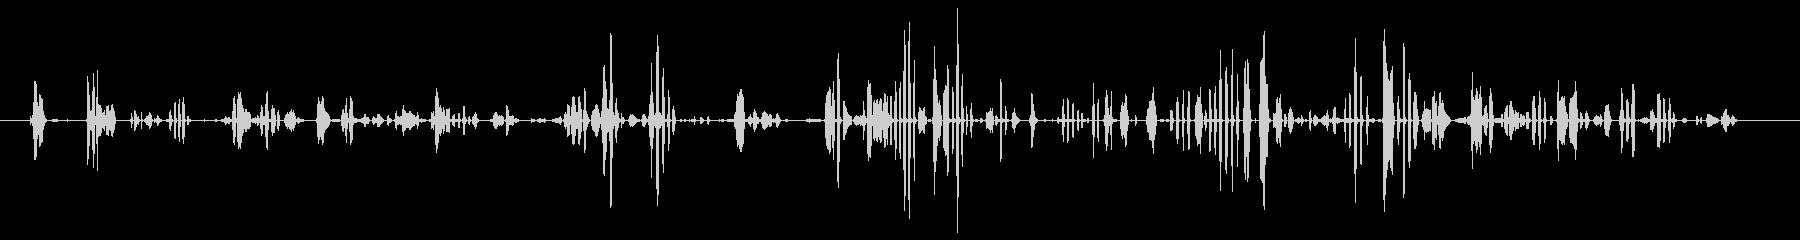 CHILD LAUGHING、GI...の未再生の波形